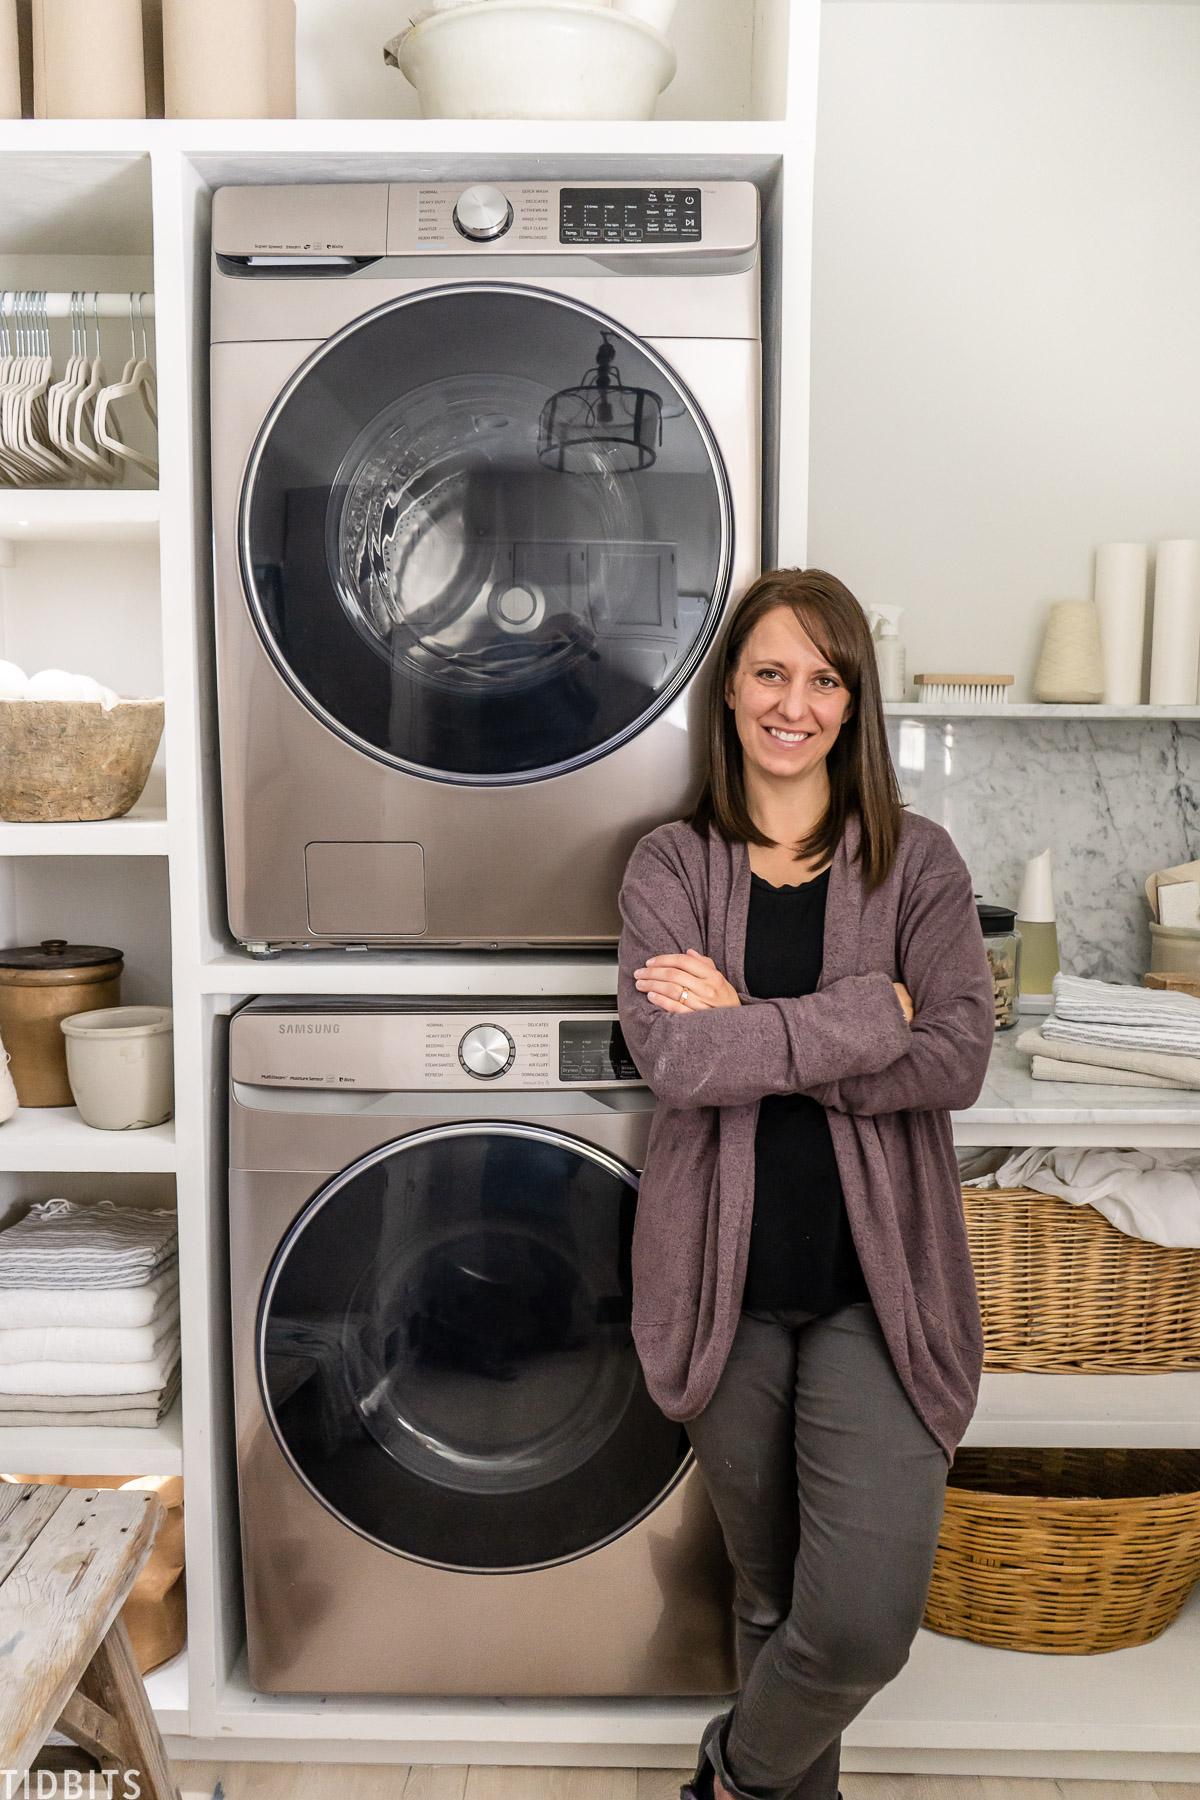 European Organic Inspired Laundry Room Design